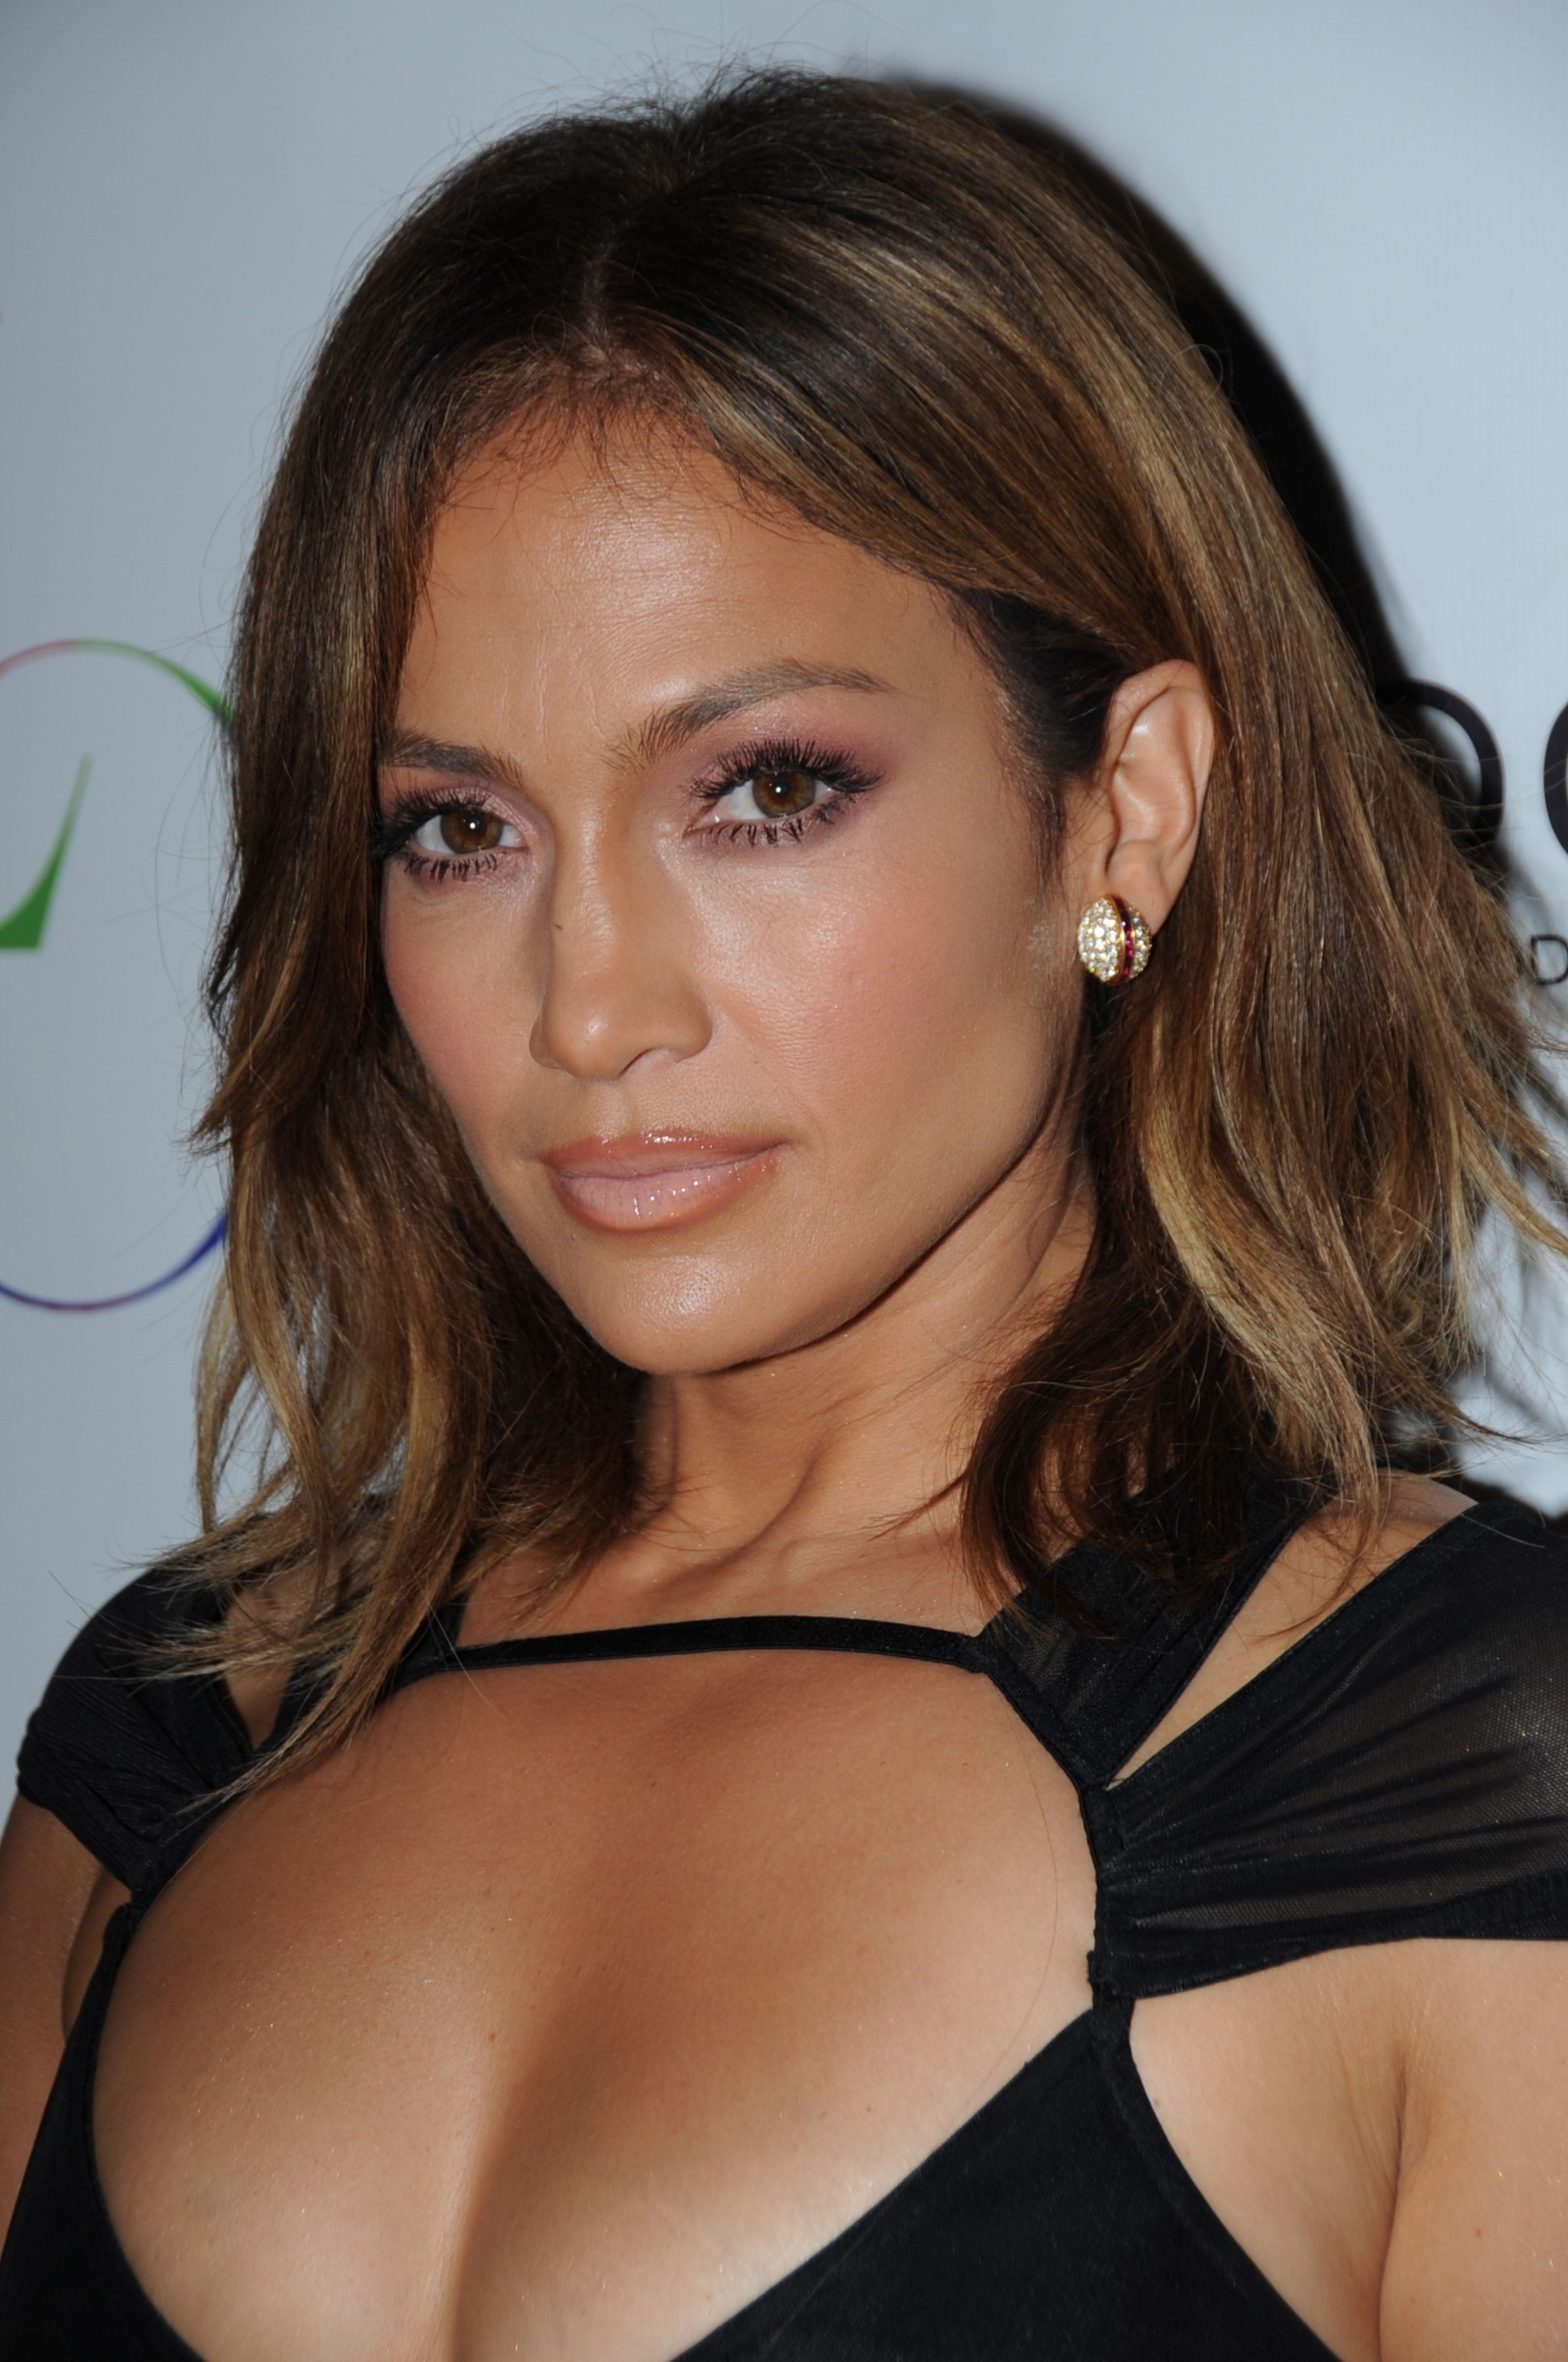 Jennifer Lopez in Sexy Naked Pics | World News - Breaking